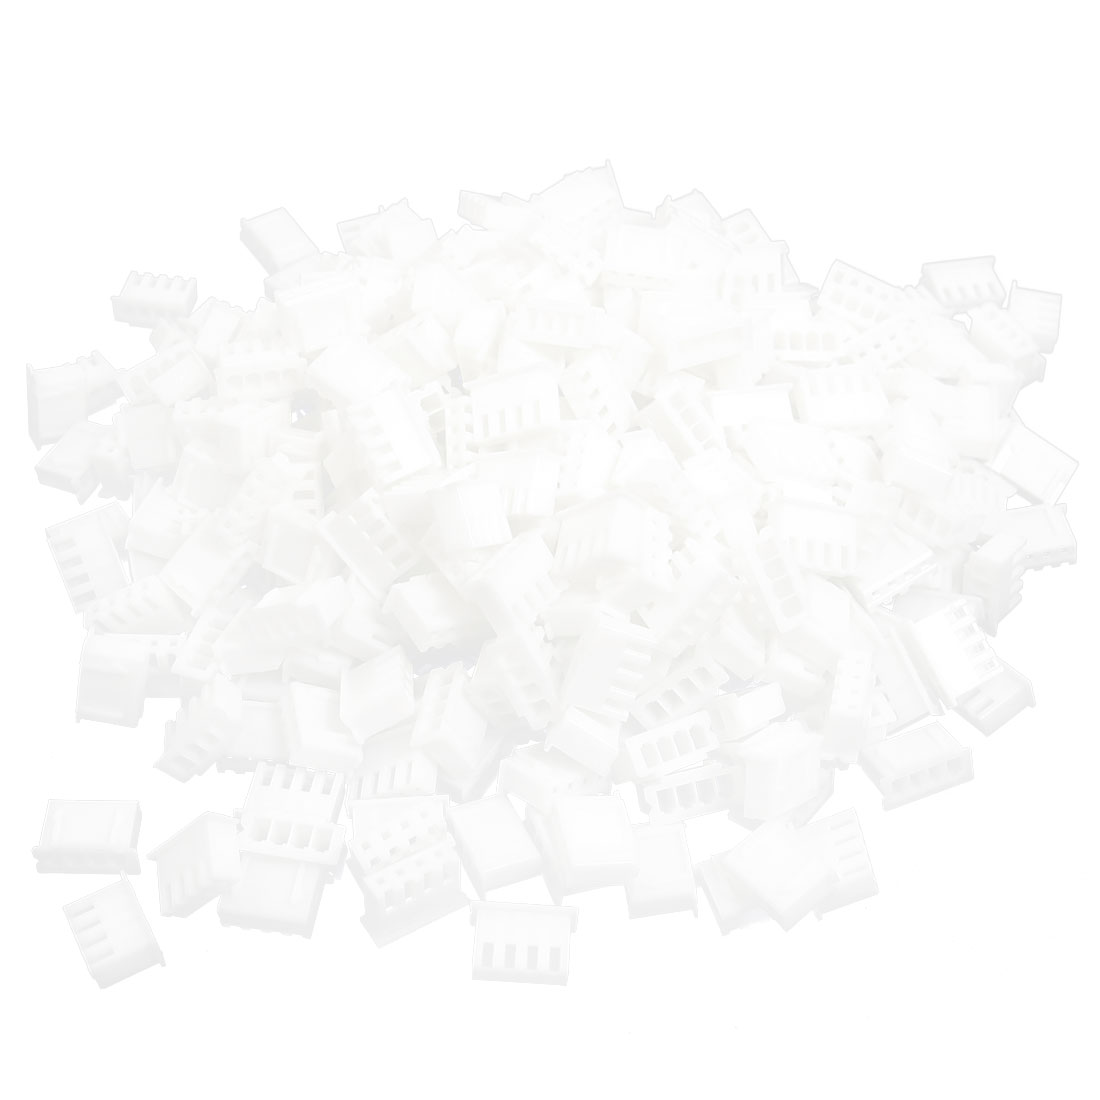 400pcs White Plastic CH 2.54mm Pitch 4 Position Connector Housing for 4P Crimp Terminal